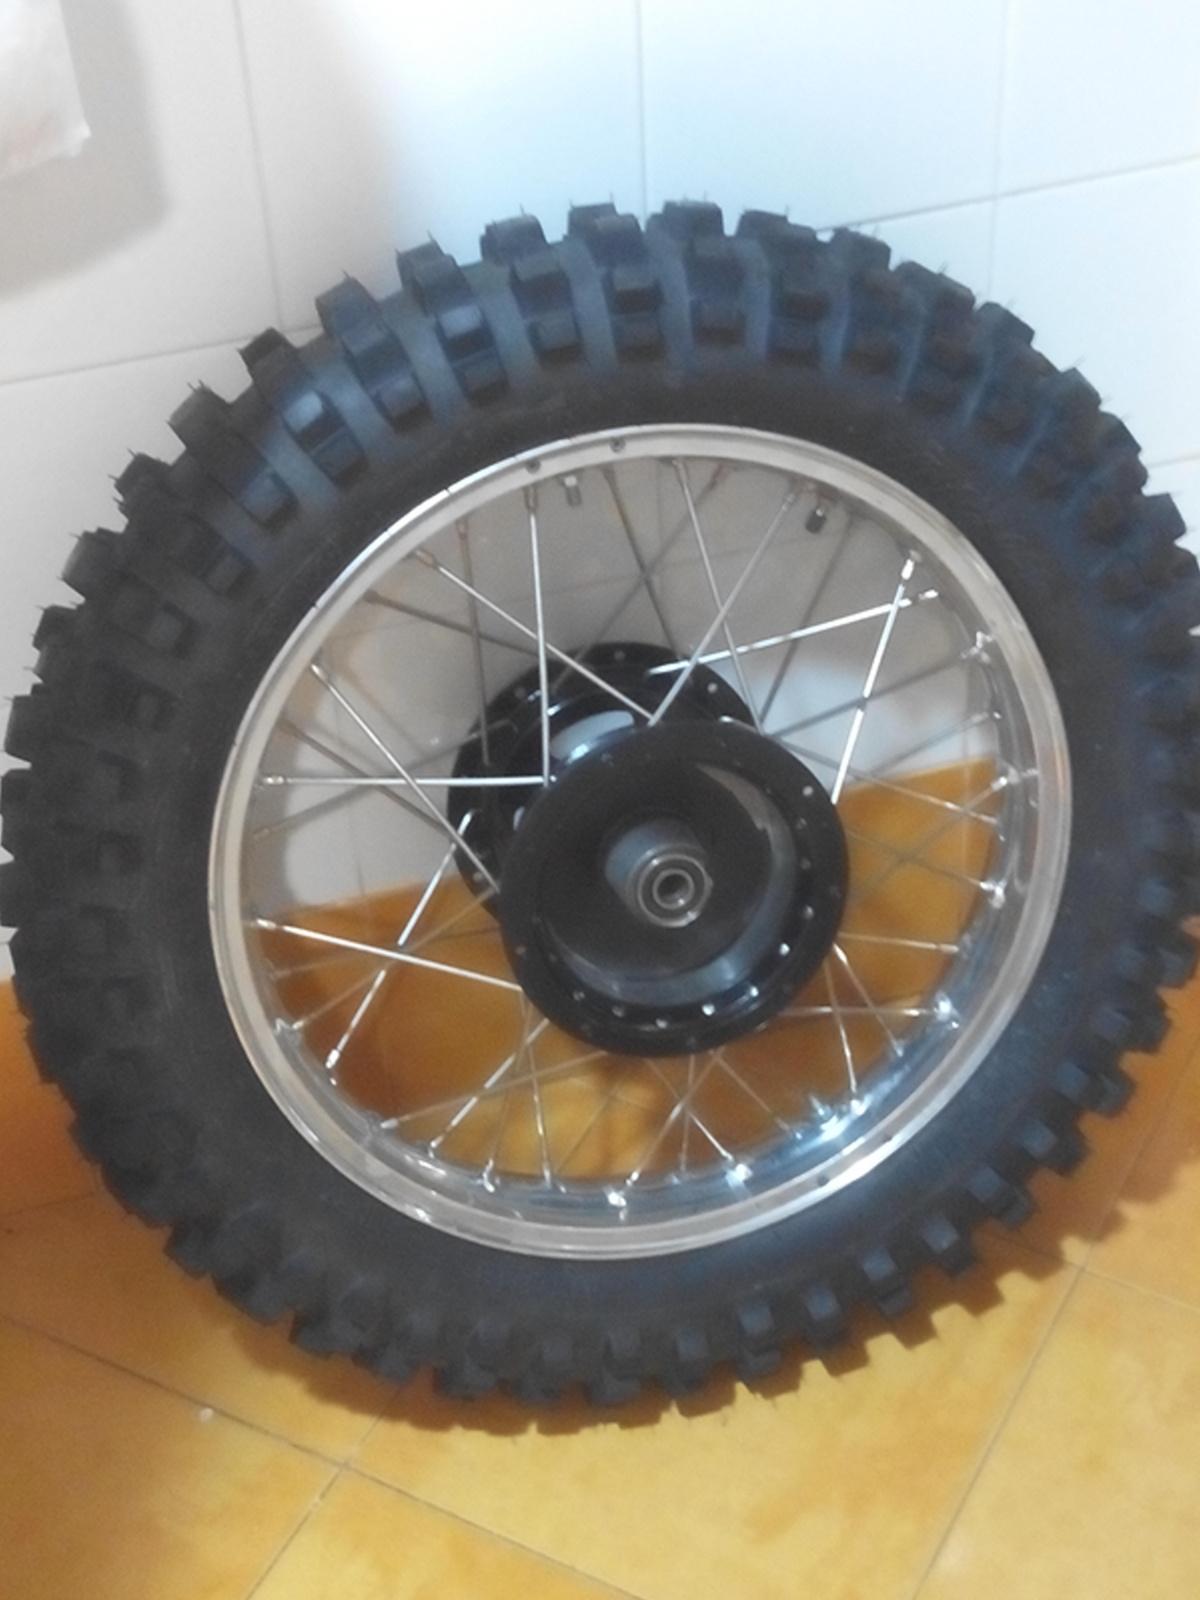 Bultaco MK11 370 - Motor - Página 2 2rha910